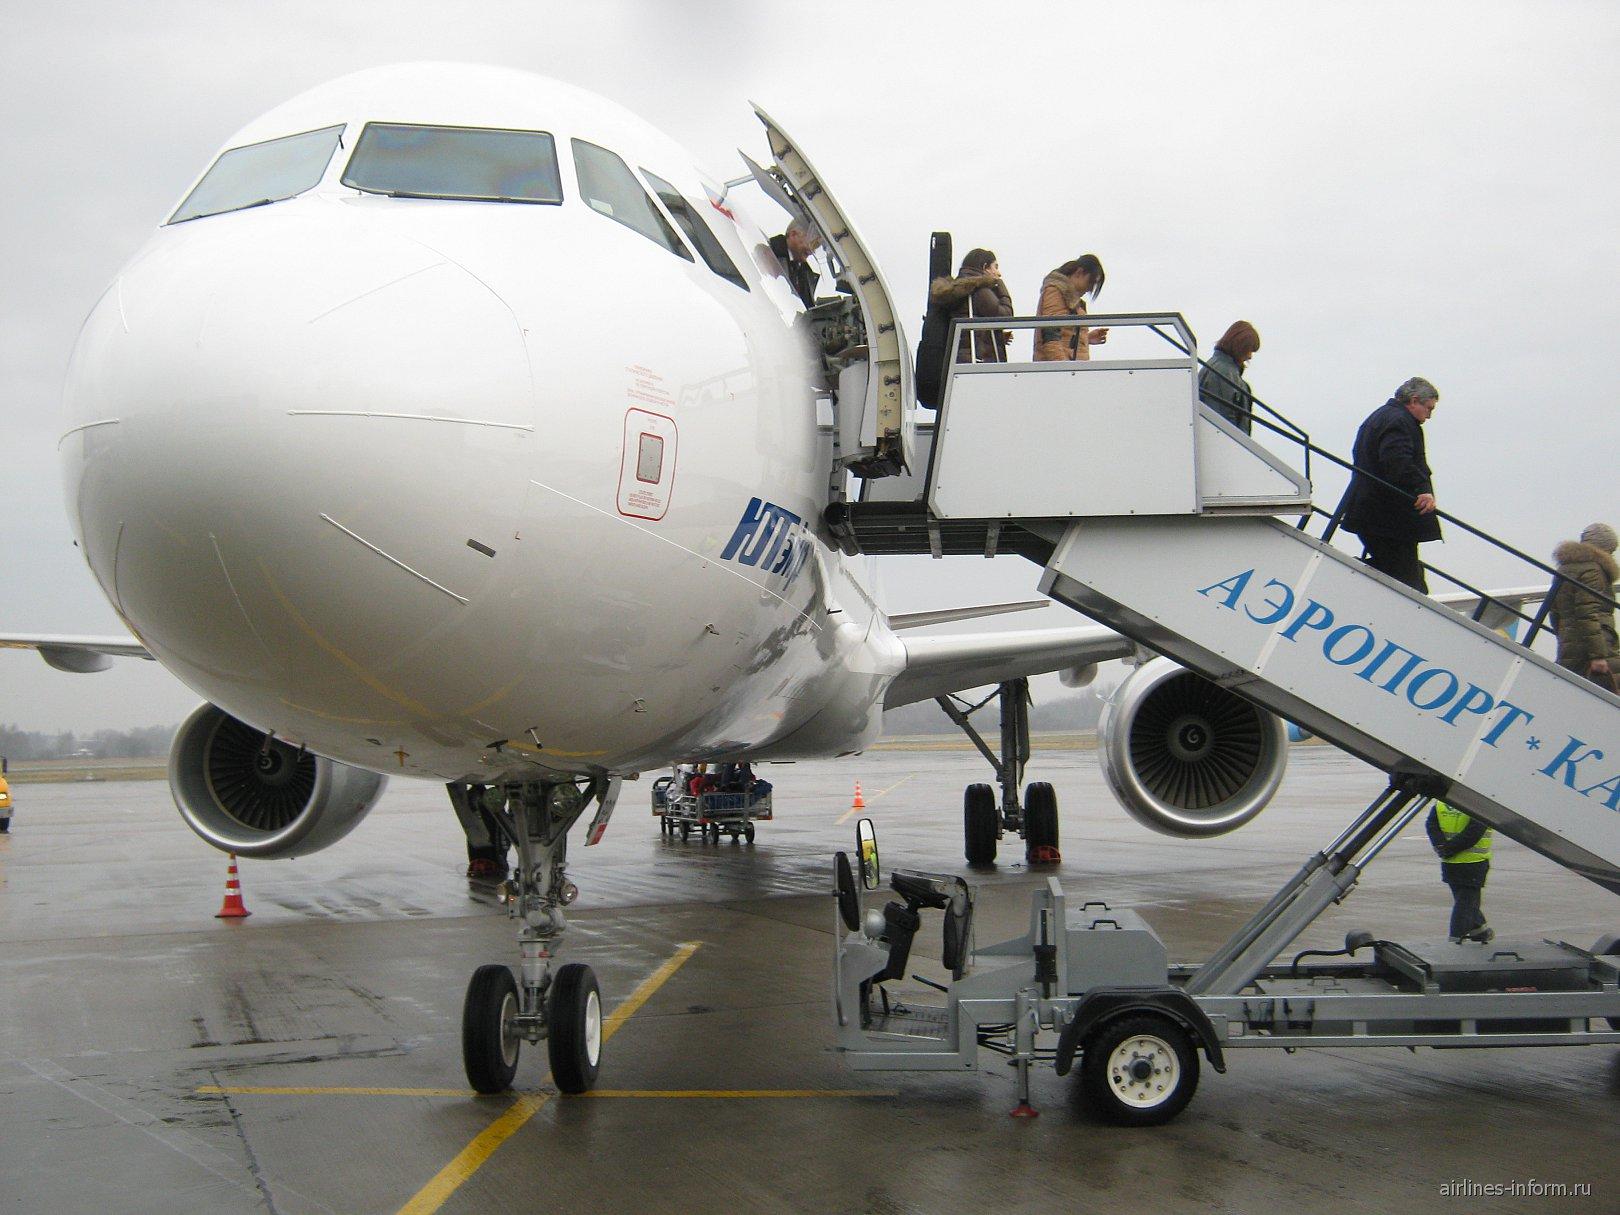 Москва (Внуково) - Калининград (Храброво) на новом Аэробусе-321 ЮТэйр